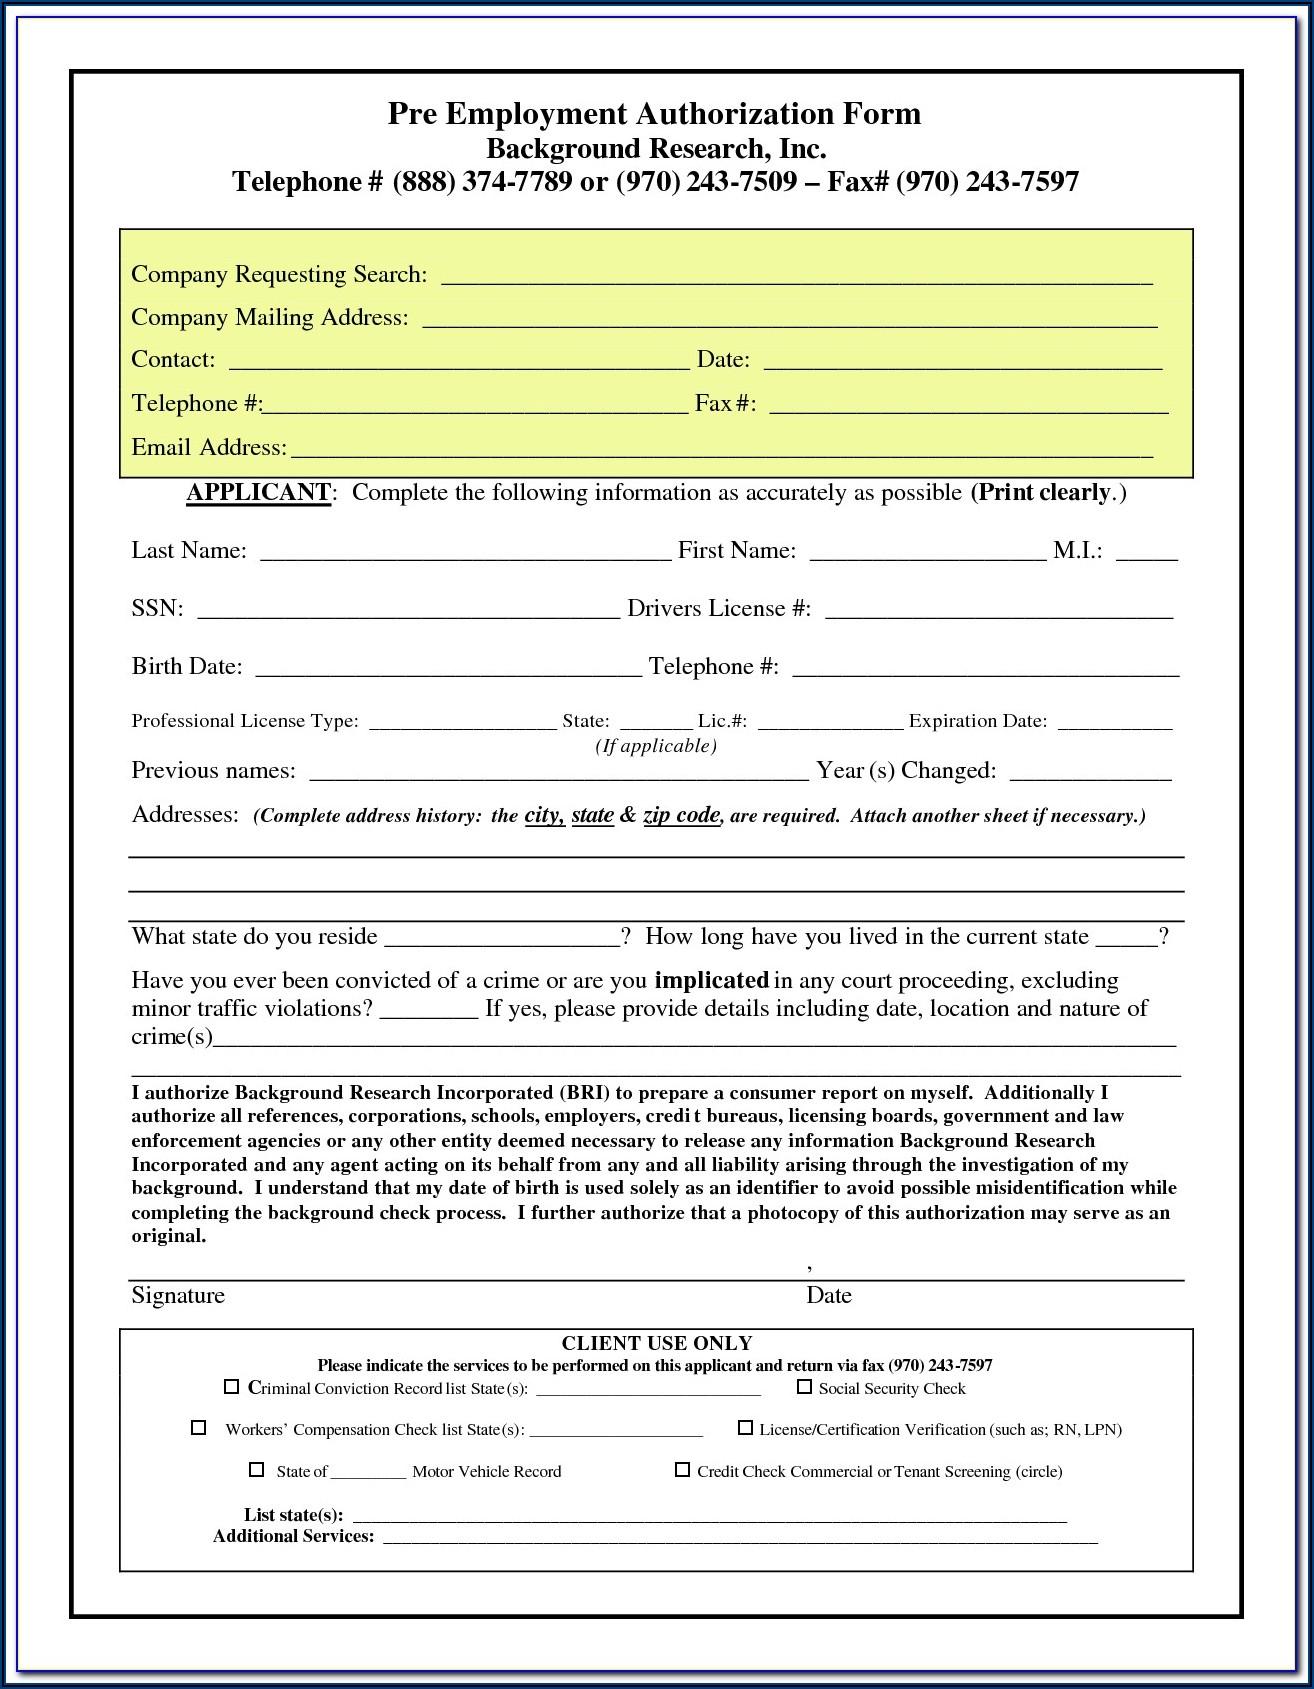 Pre Employment Background Check Authorization Form Philippines